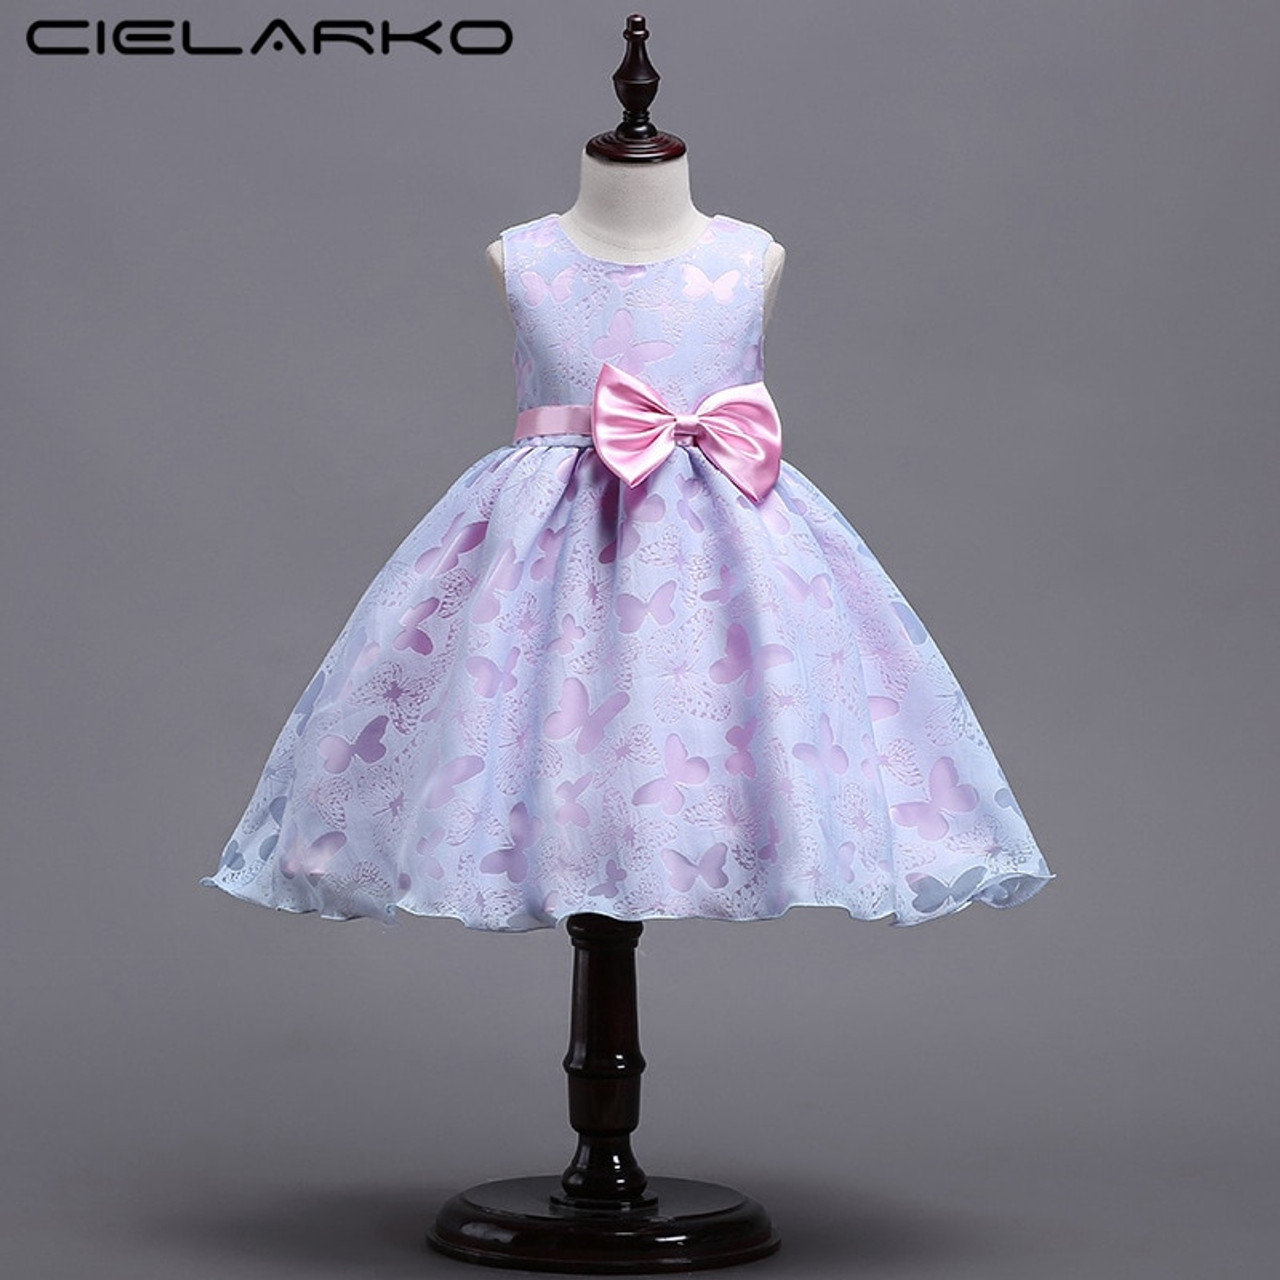 fa63c5cfa Cielarko Girls Dress Butterfly Princess Pageant Dresses Bow Kids ...